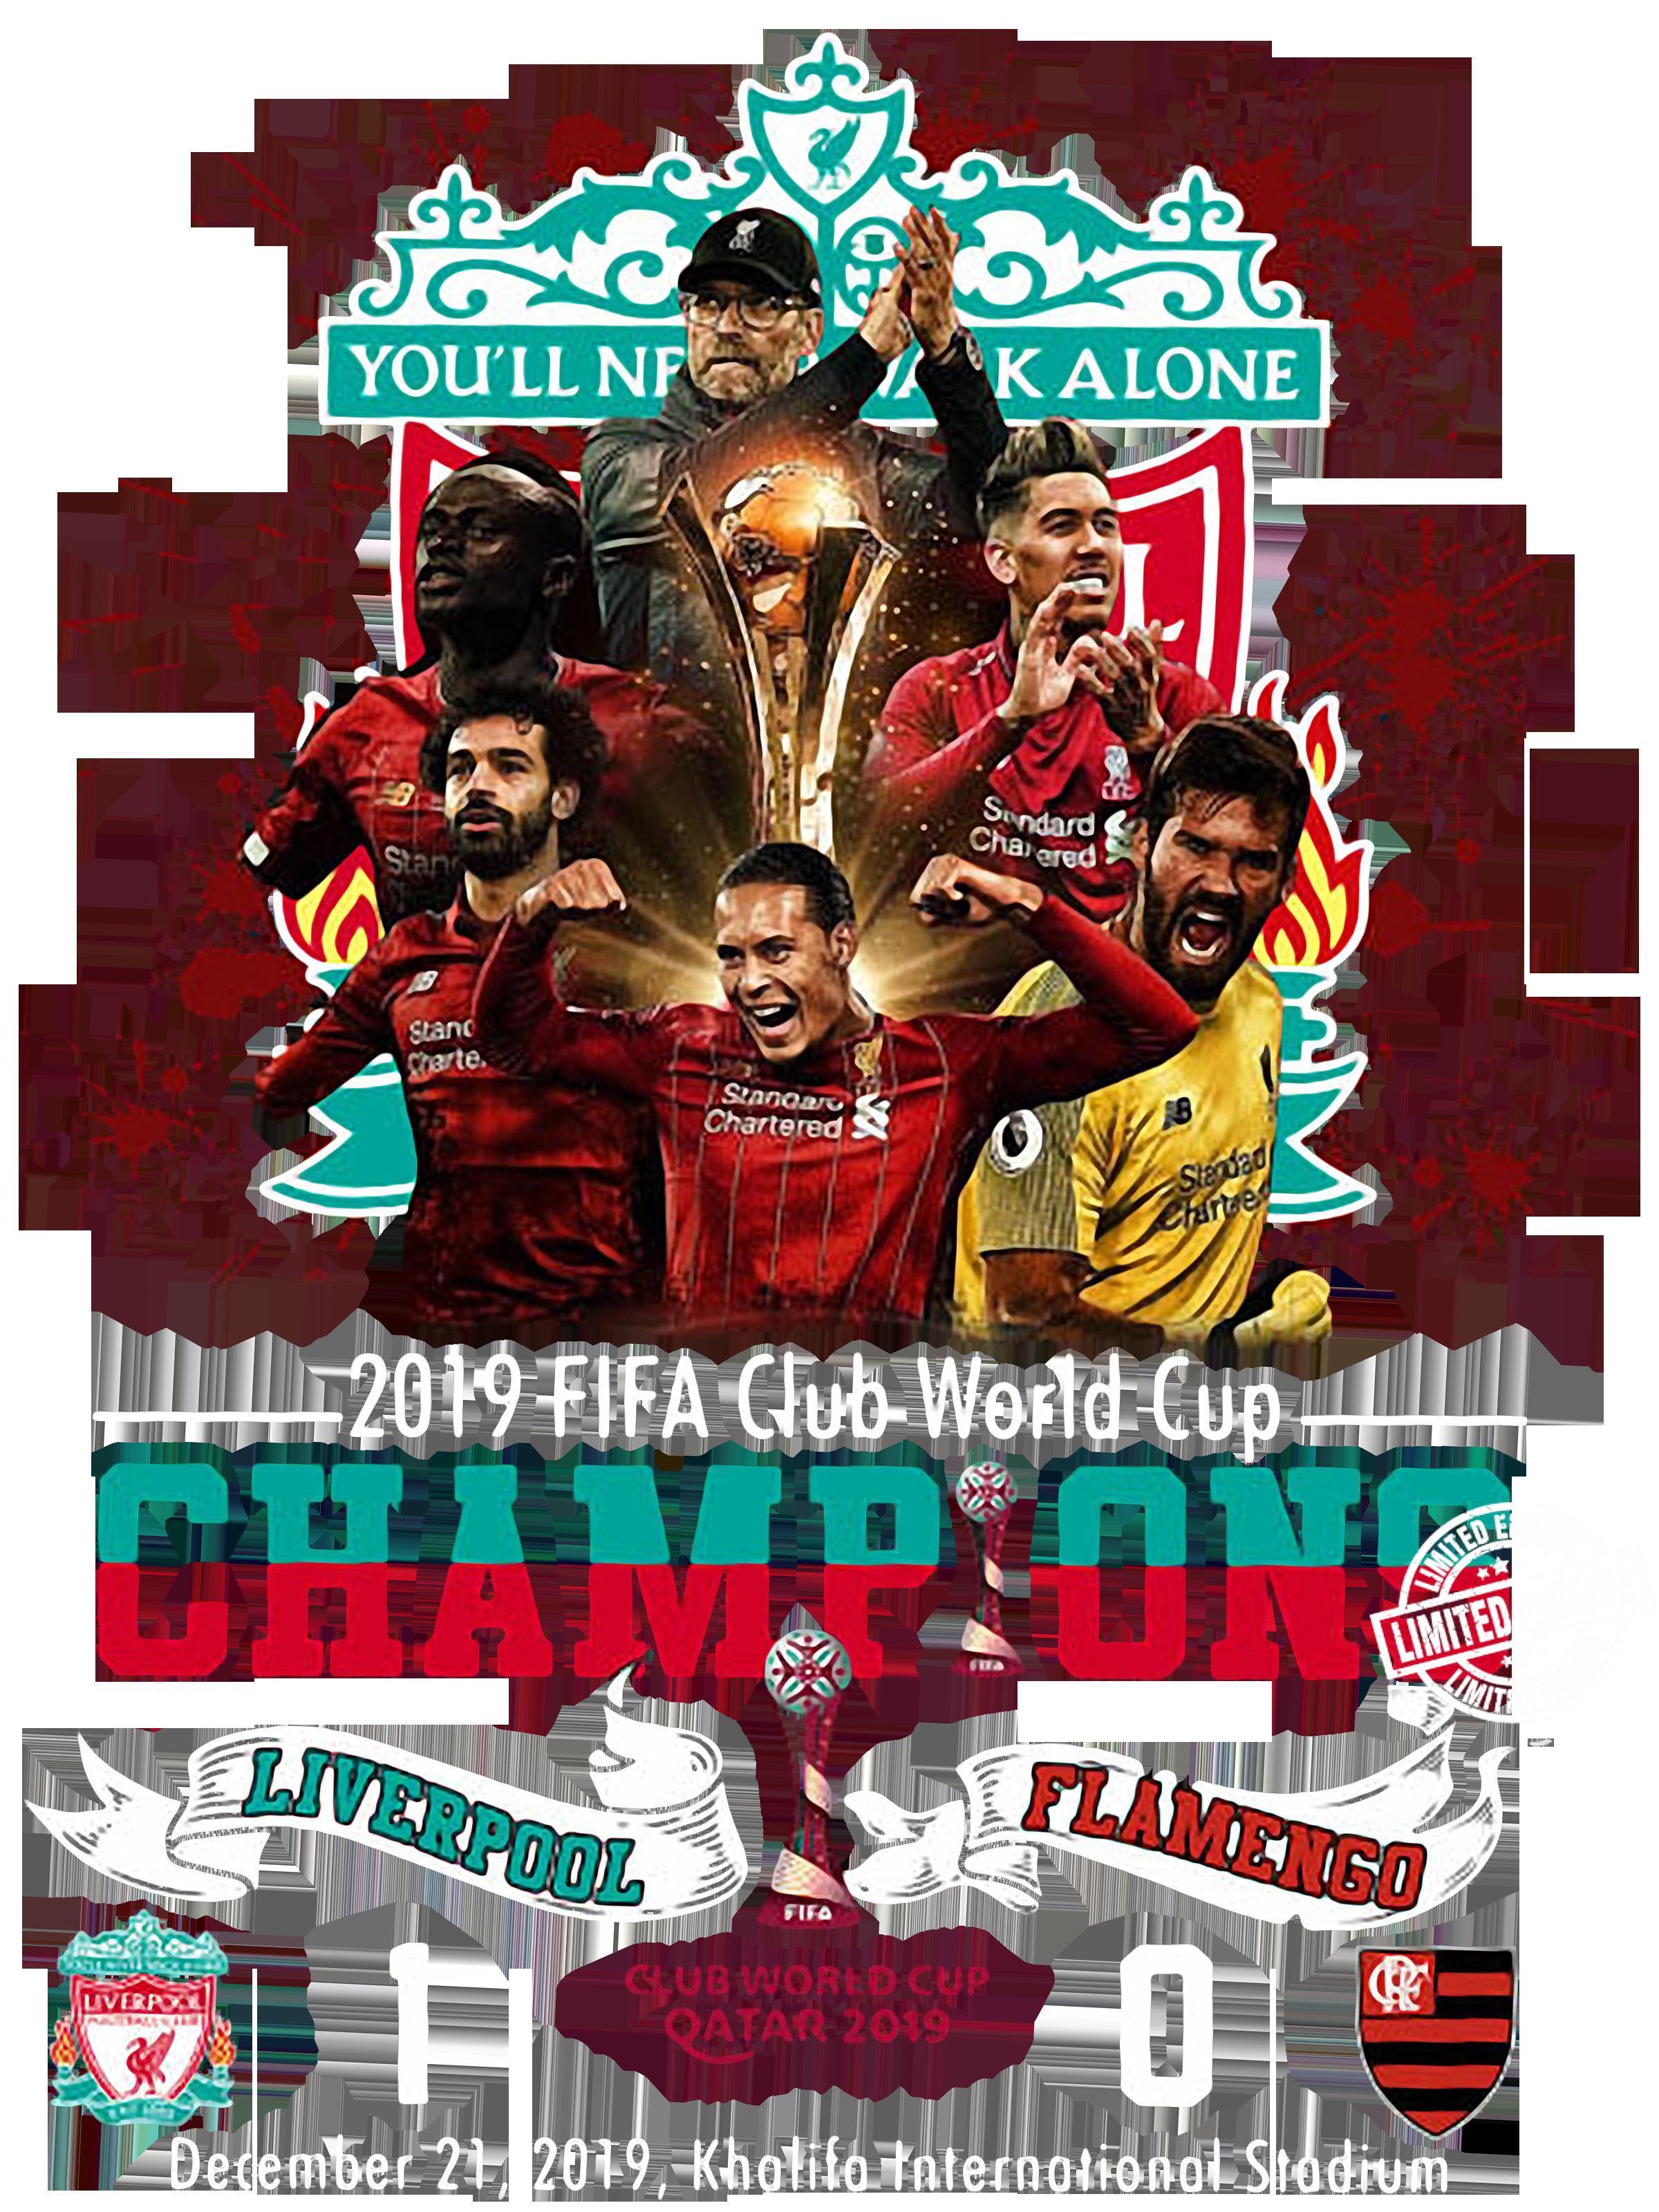 2019 fifa club world cup champions liverpool flamengo